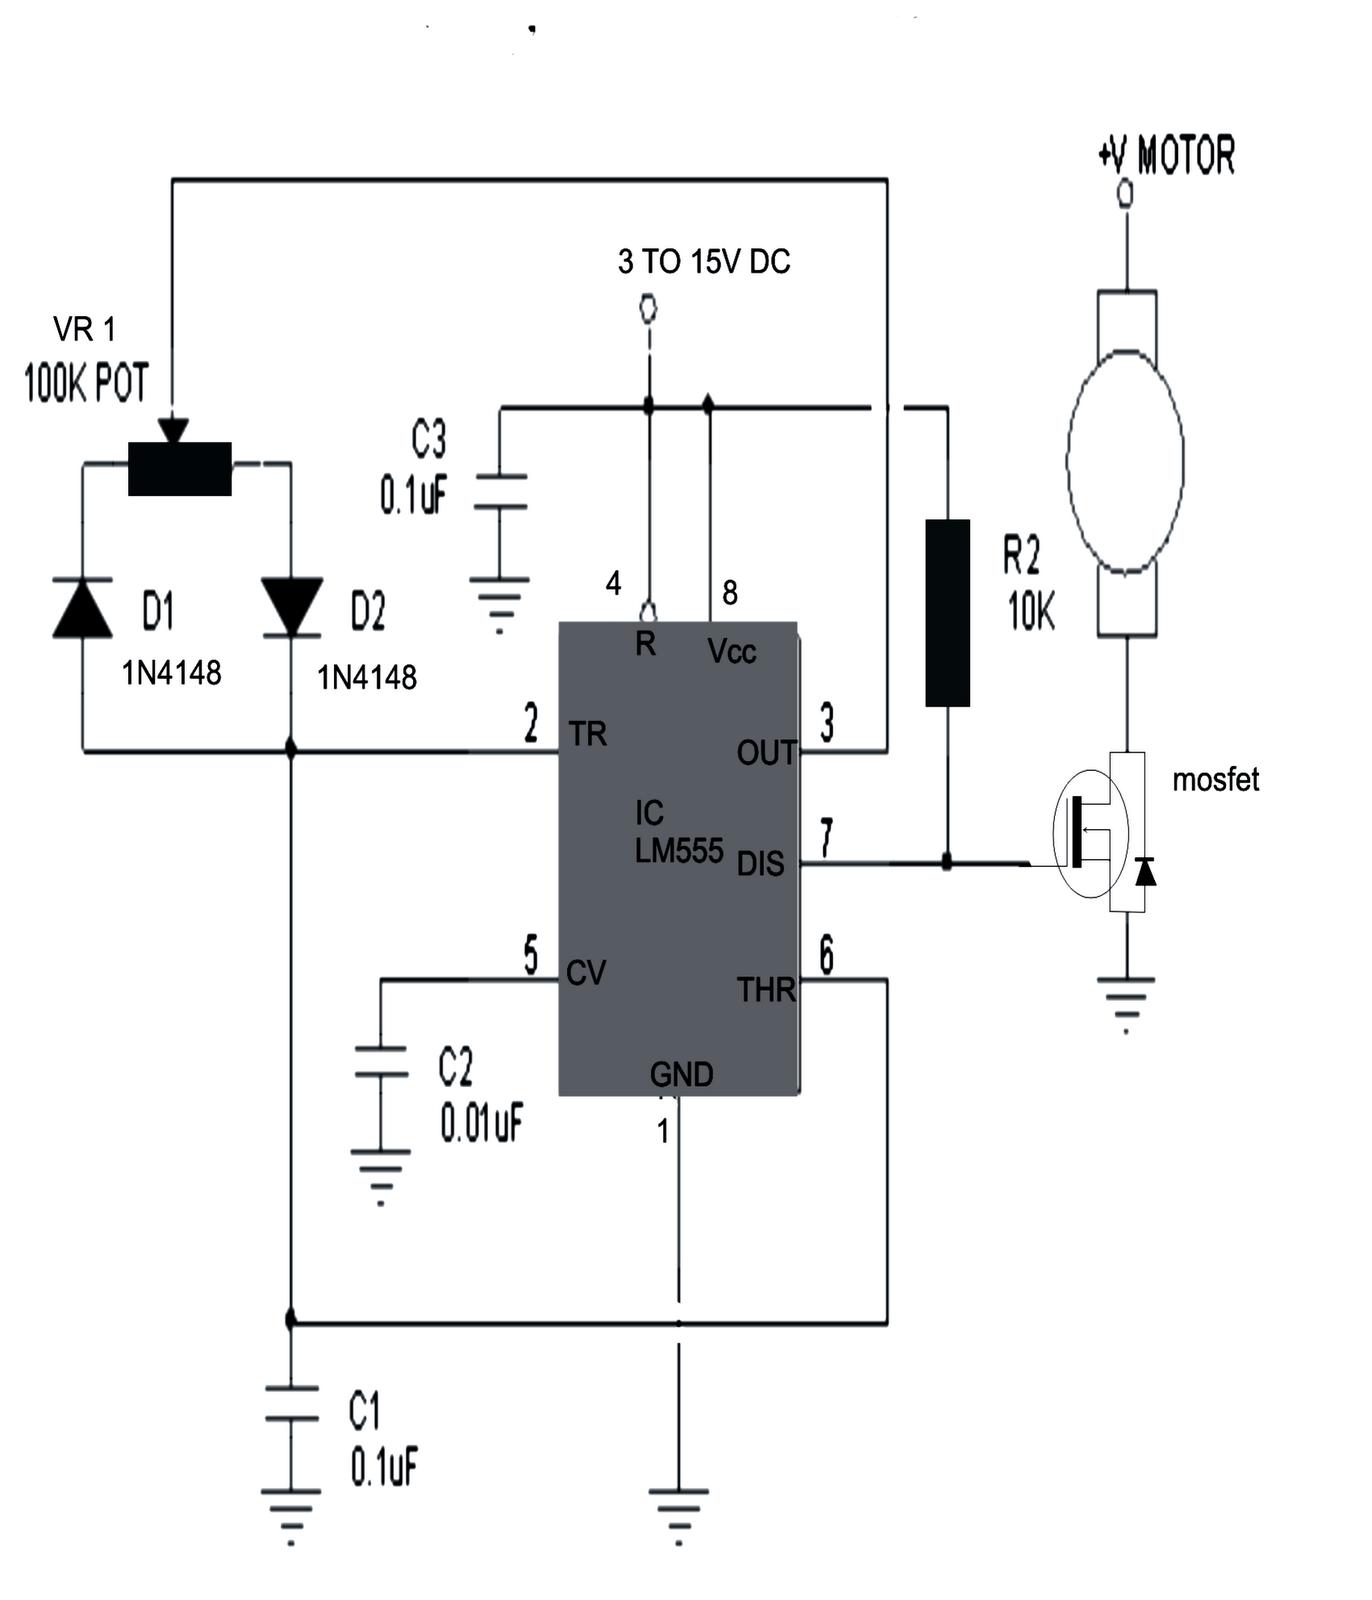 ac motor speed controller circuit diagram 2000 s10 alternator wiring 220v dc contel digarm images